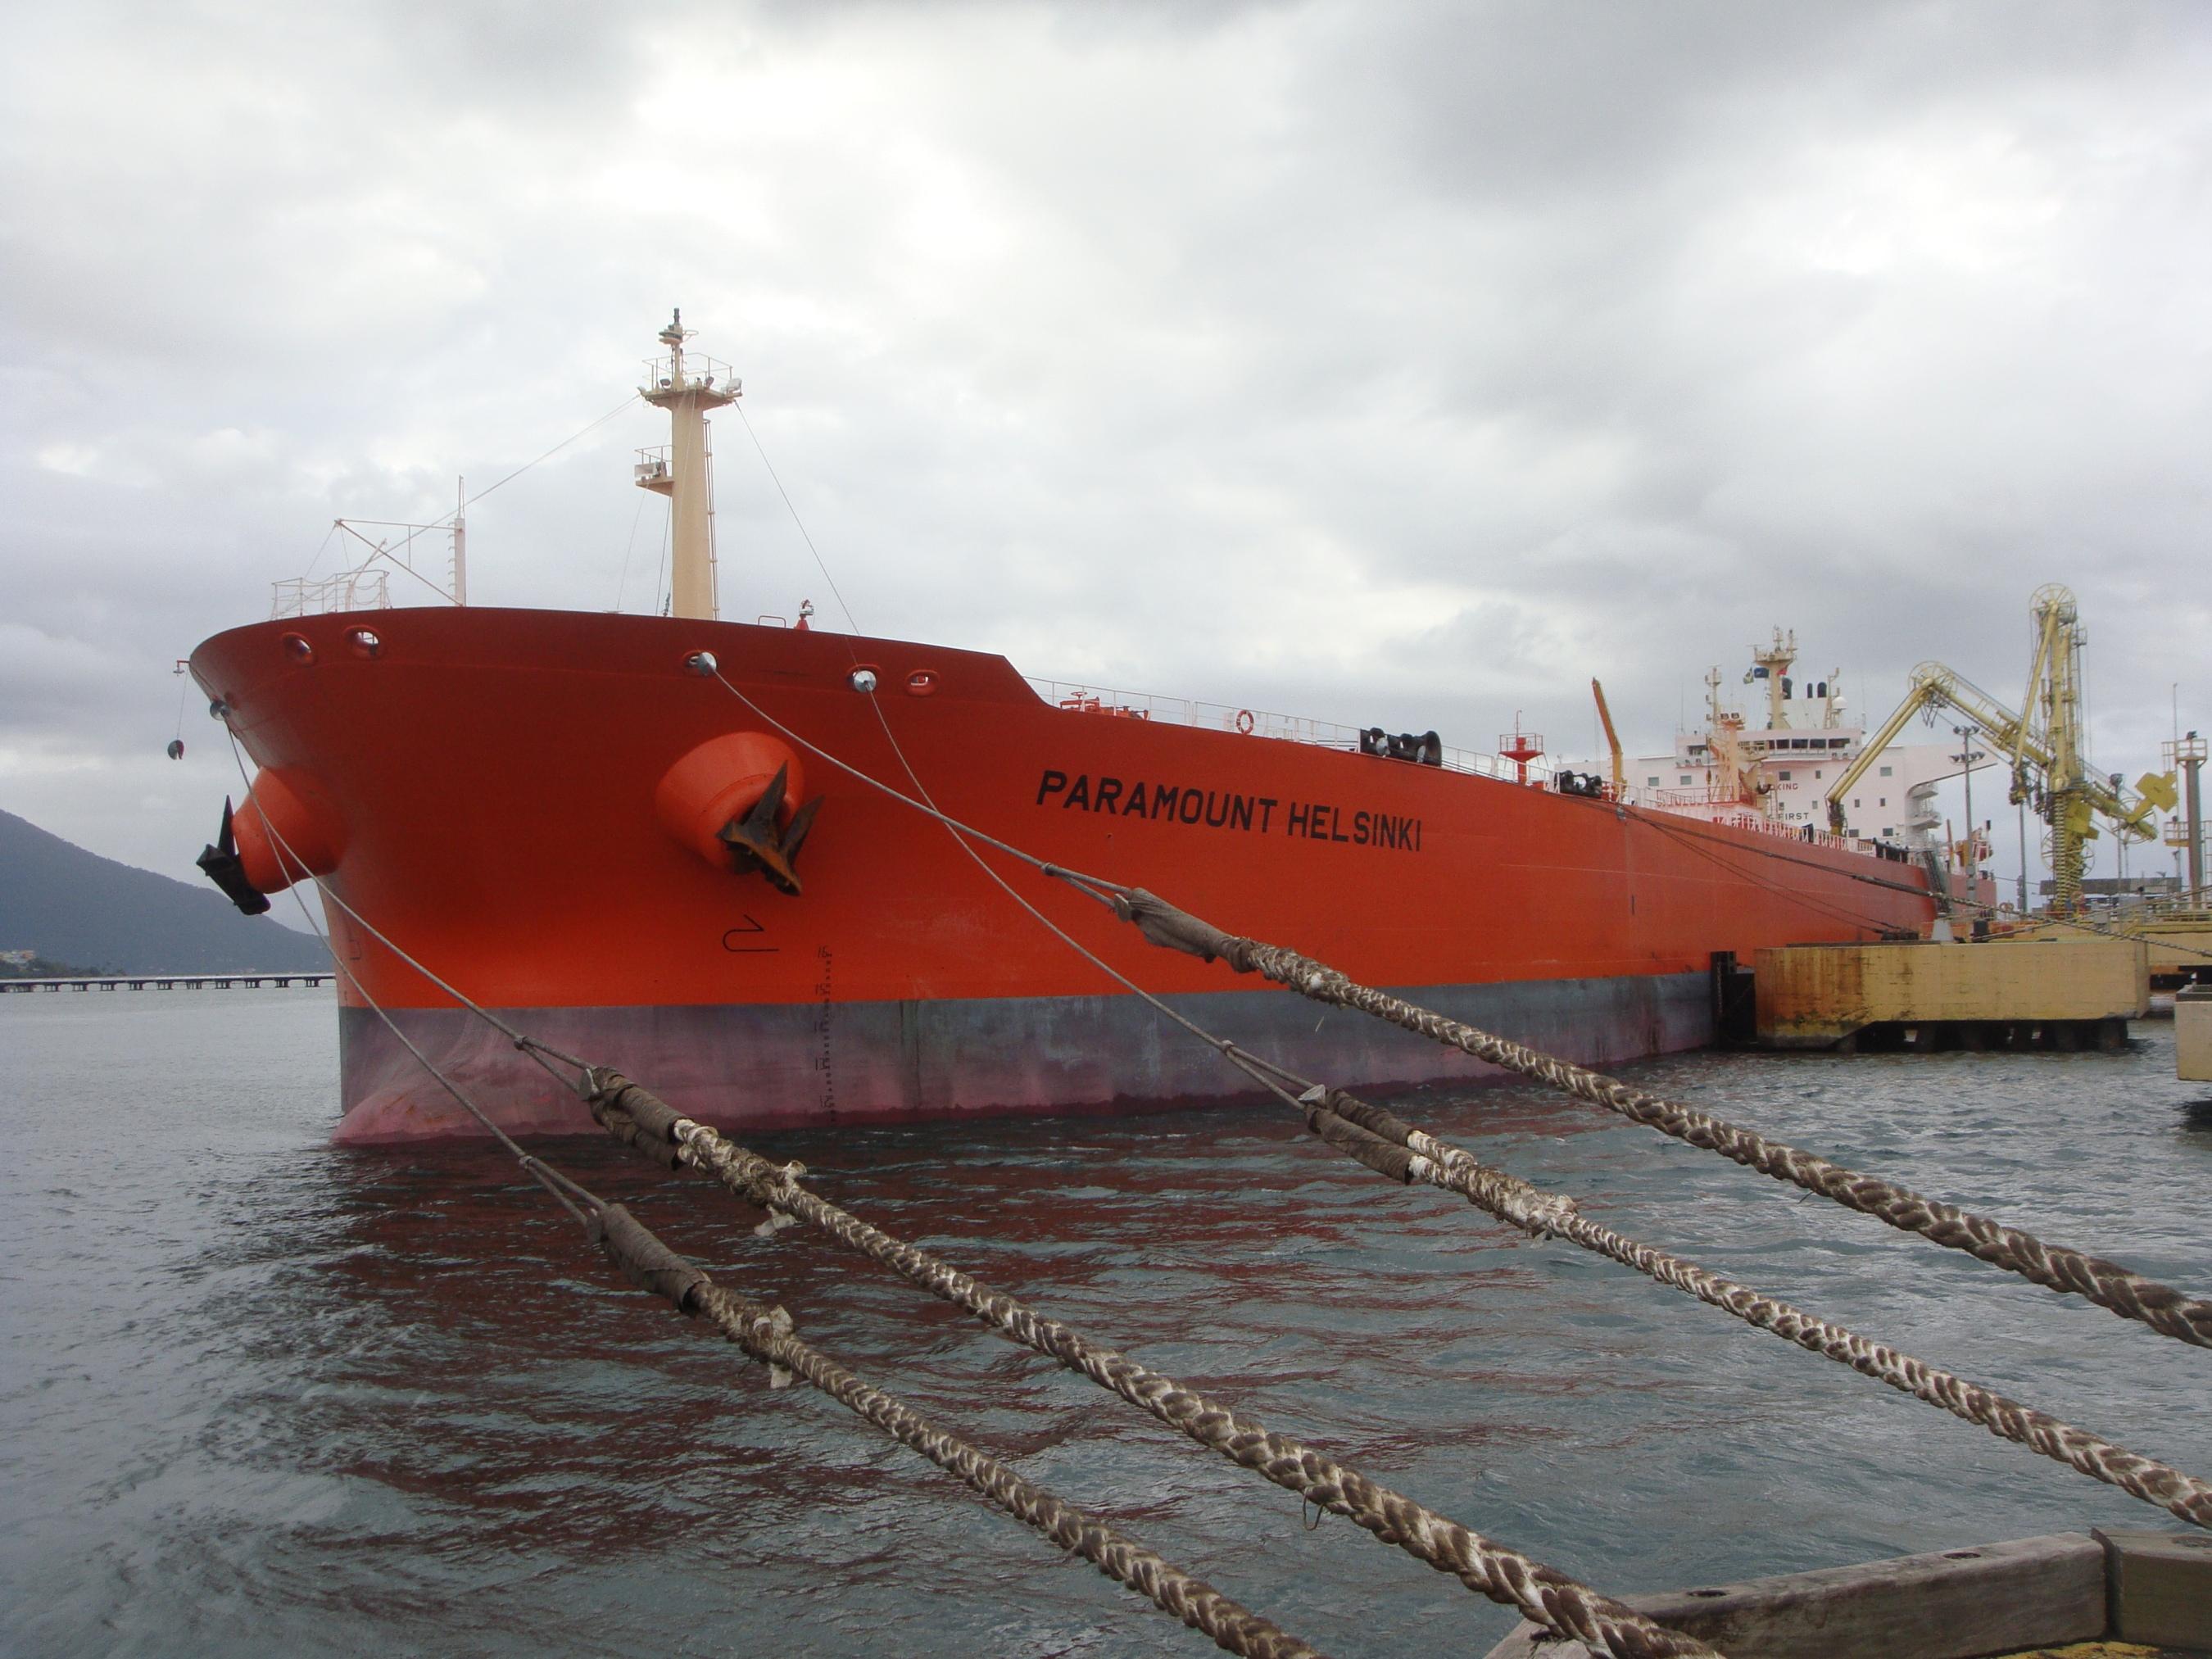 PARAMOUNT HELSINKI - 9453963 - CRUDE OIL TANKER | Maritime-Connector.com